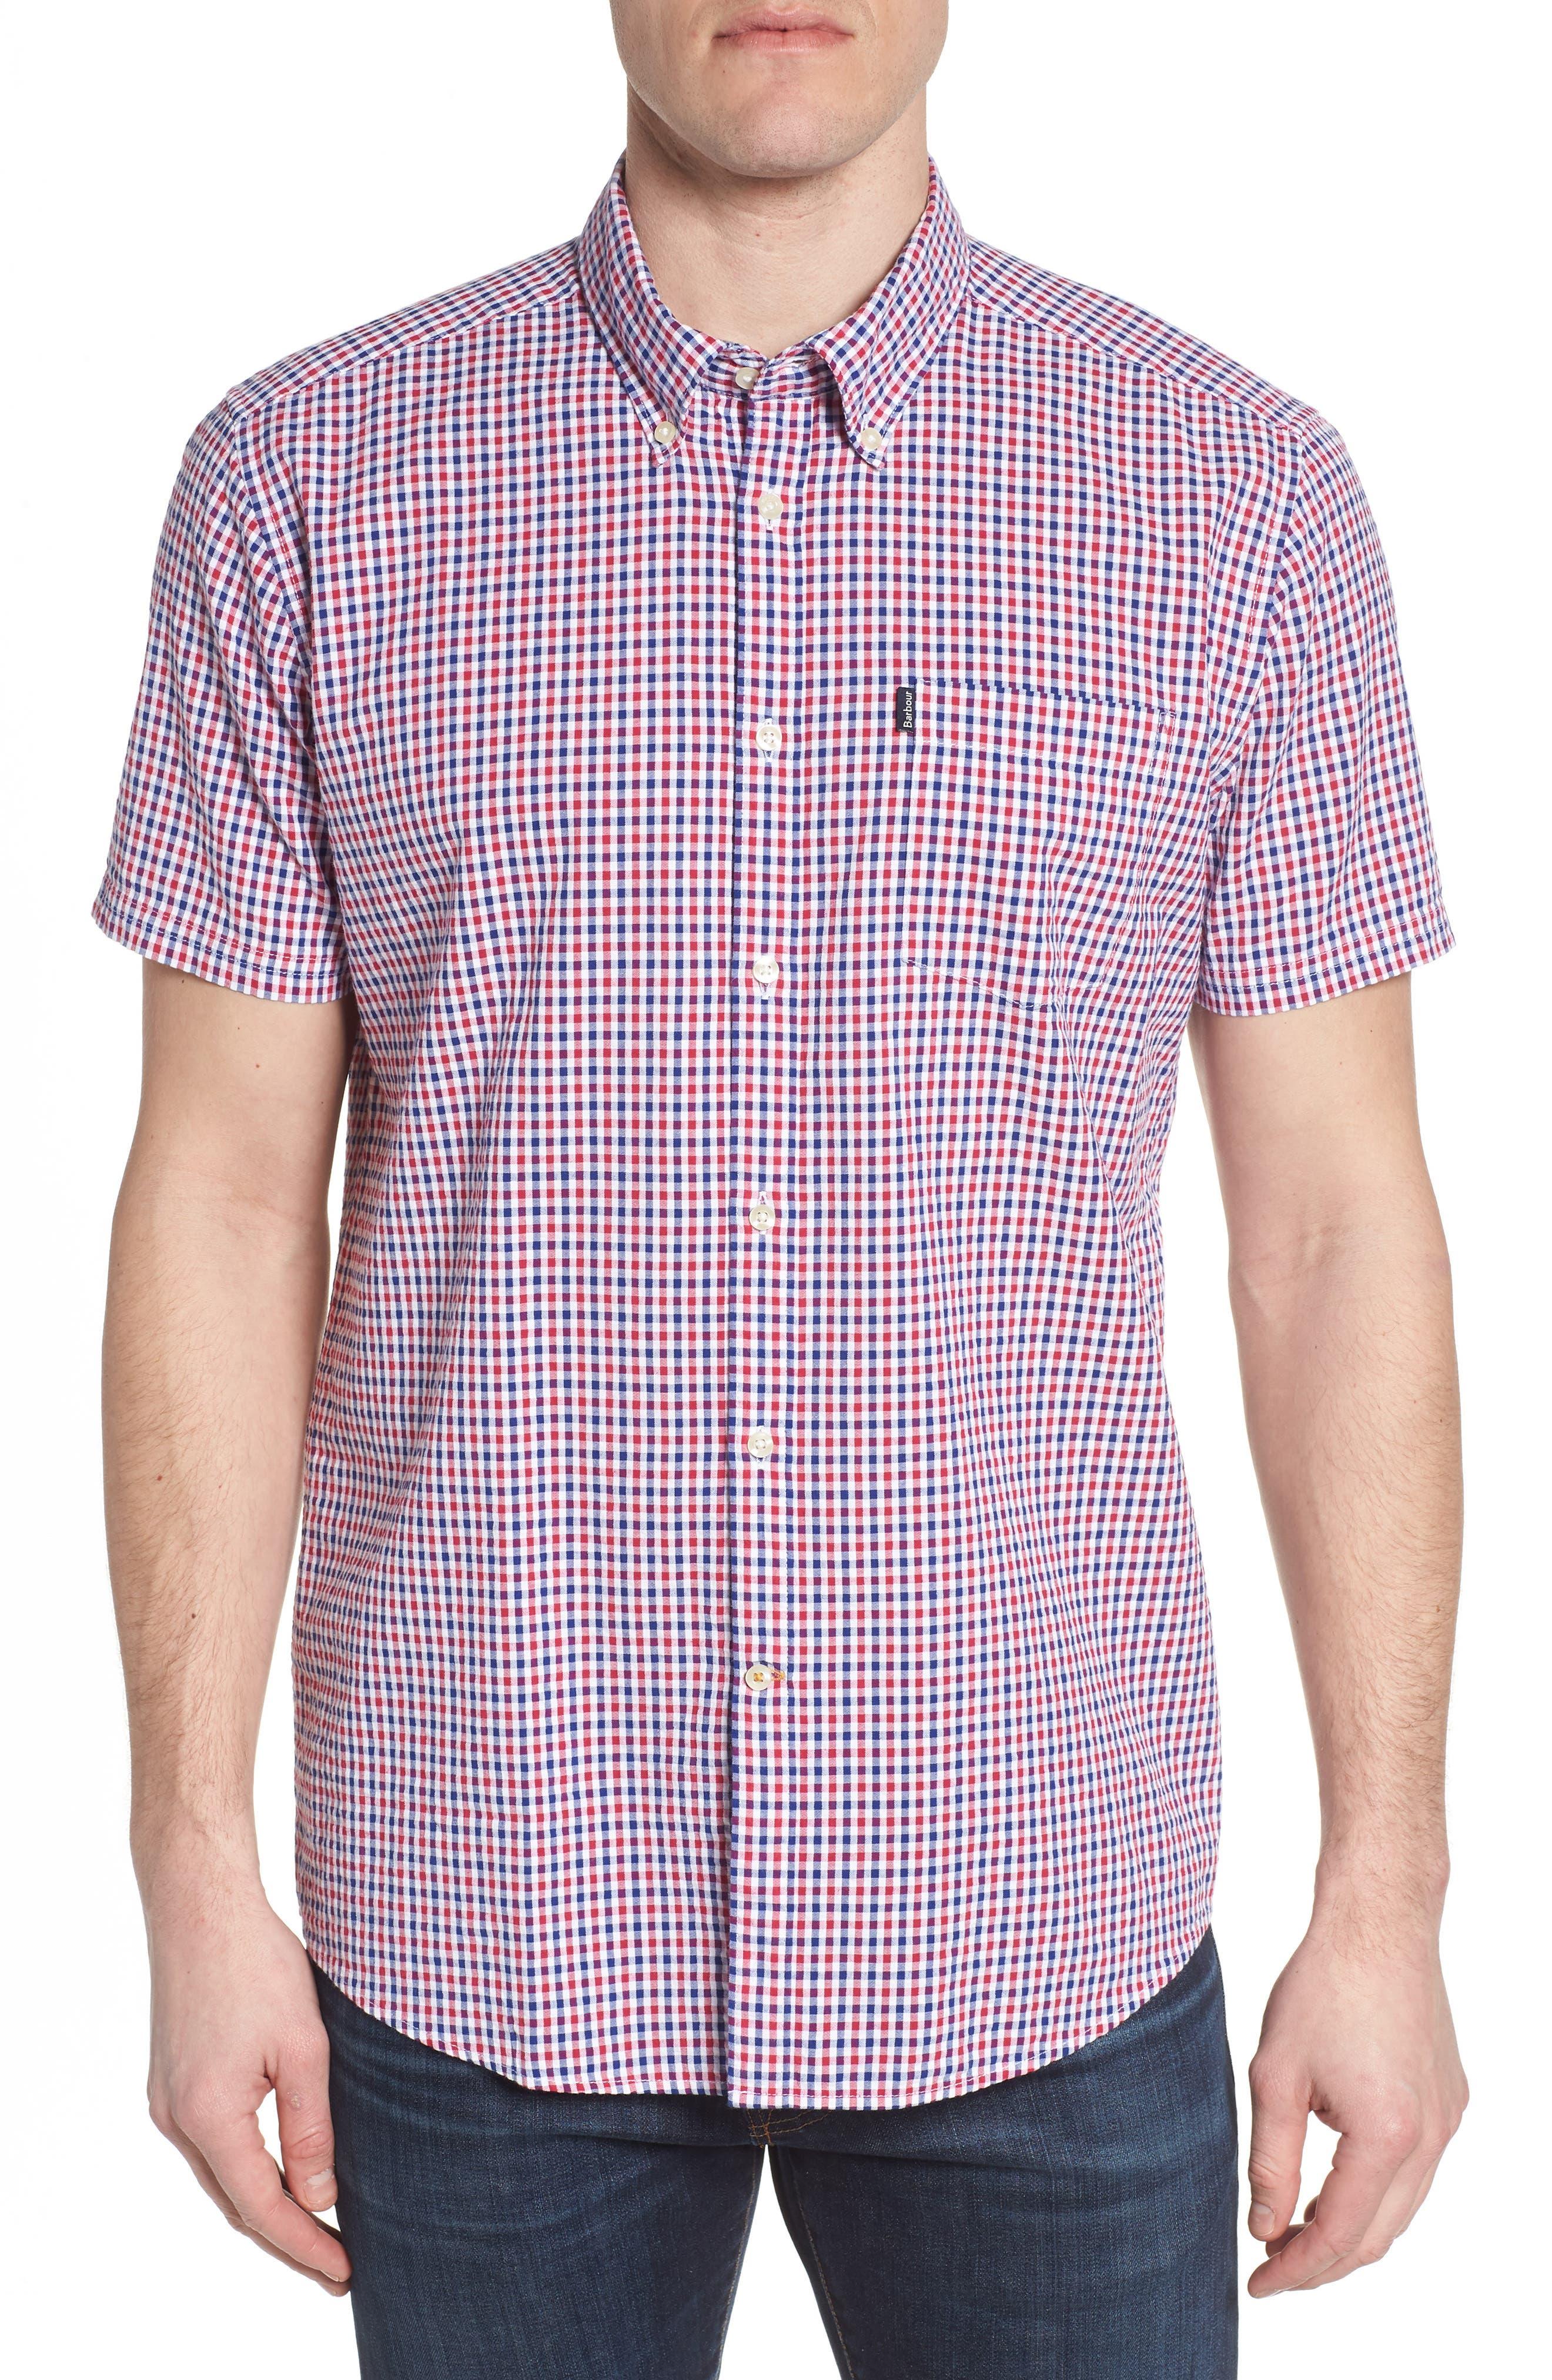 Taylor Regular Fit Check Short Sleeve Sport Shirt,                         Main,                         color, Navy